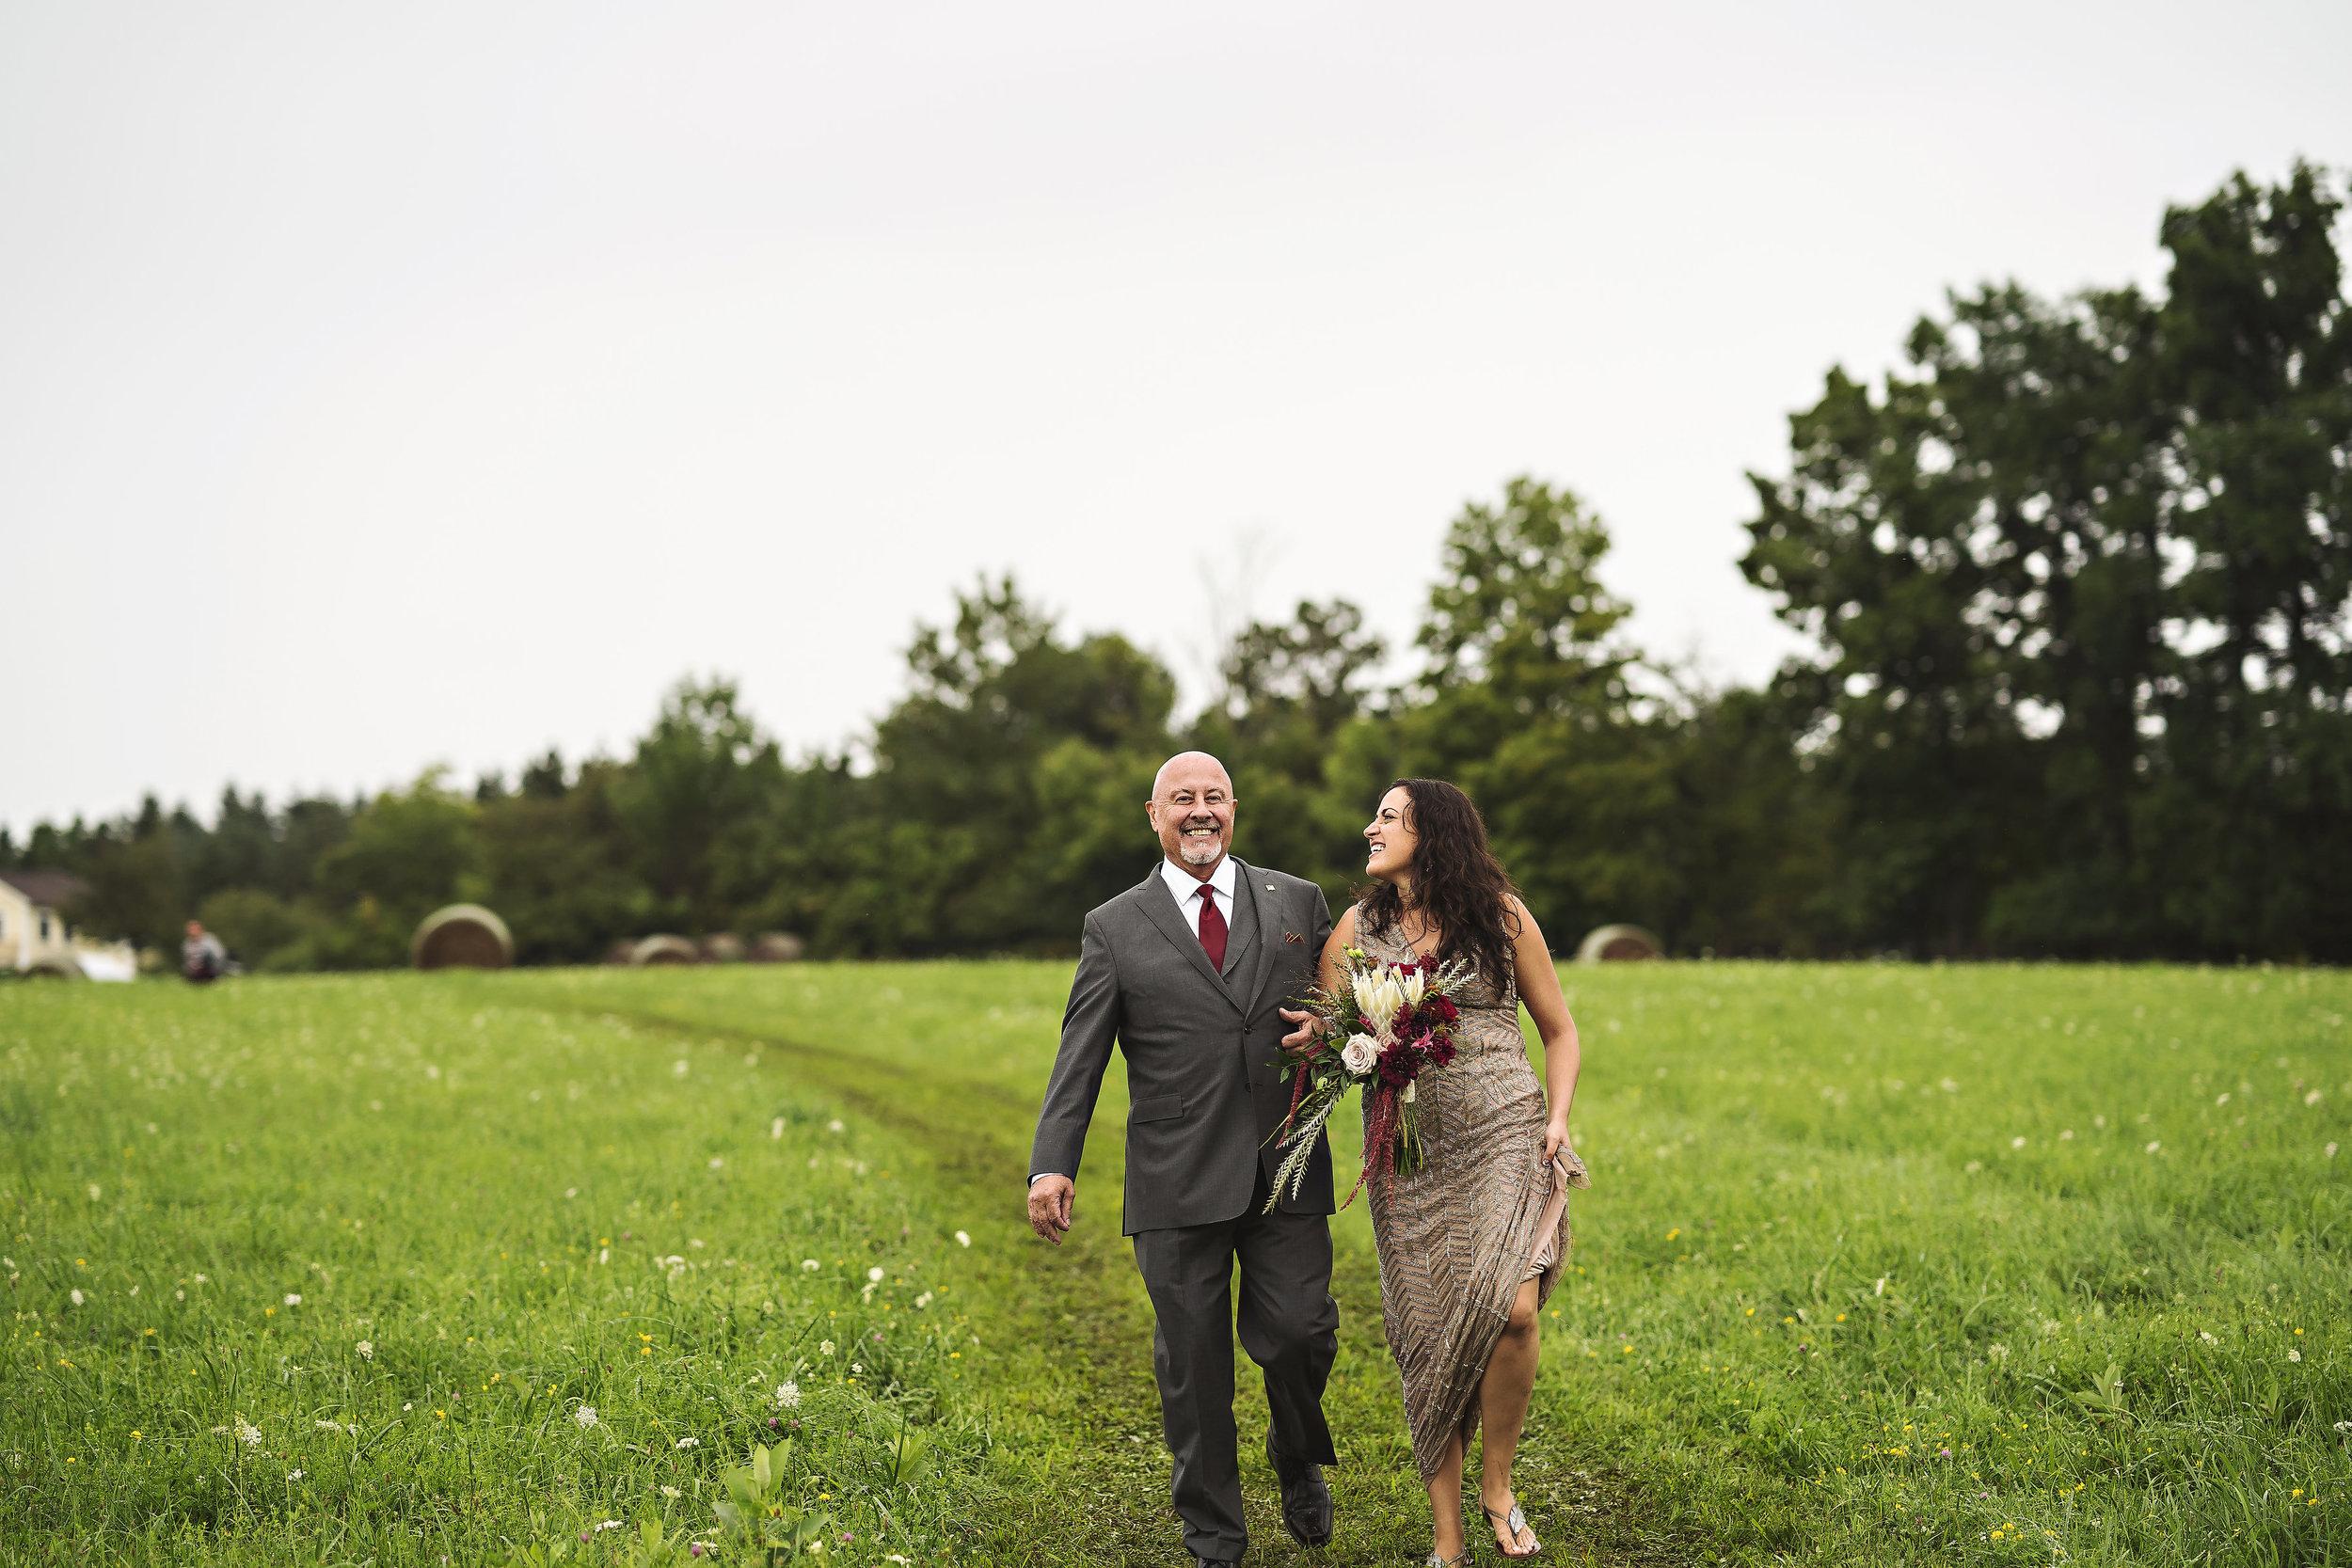 upstate-ny-wedding-jove-meyer-events-inbal-sivan-08.jpg